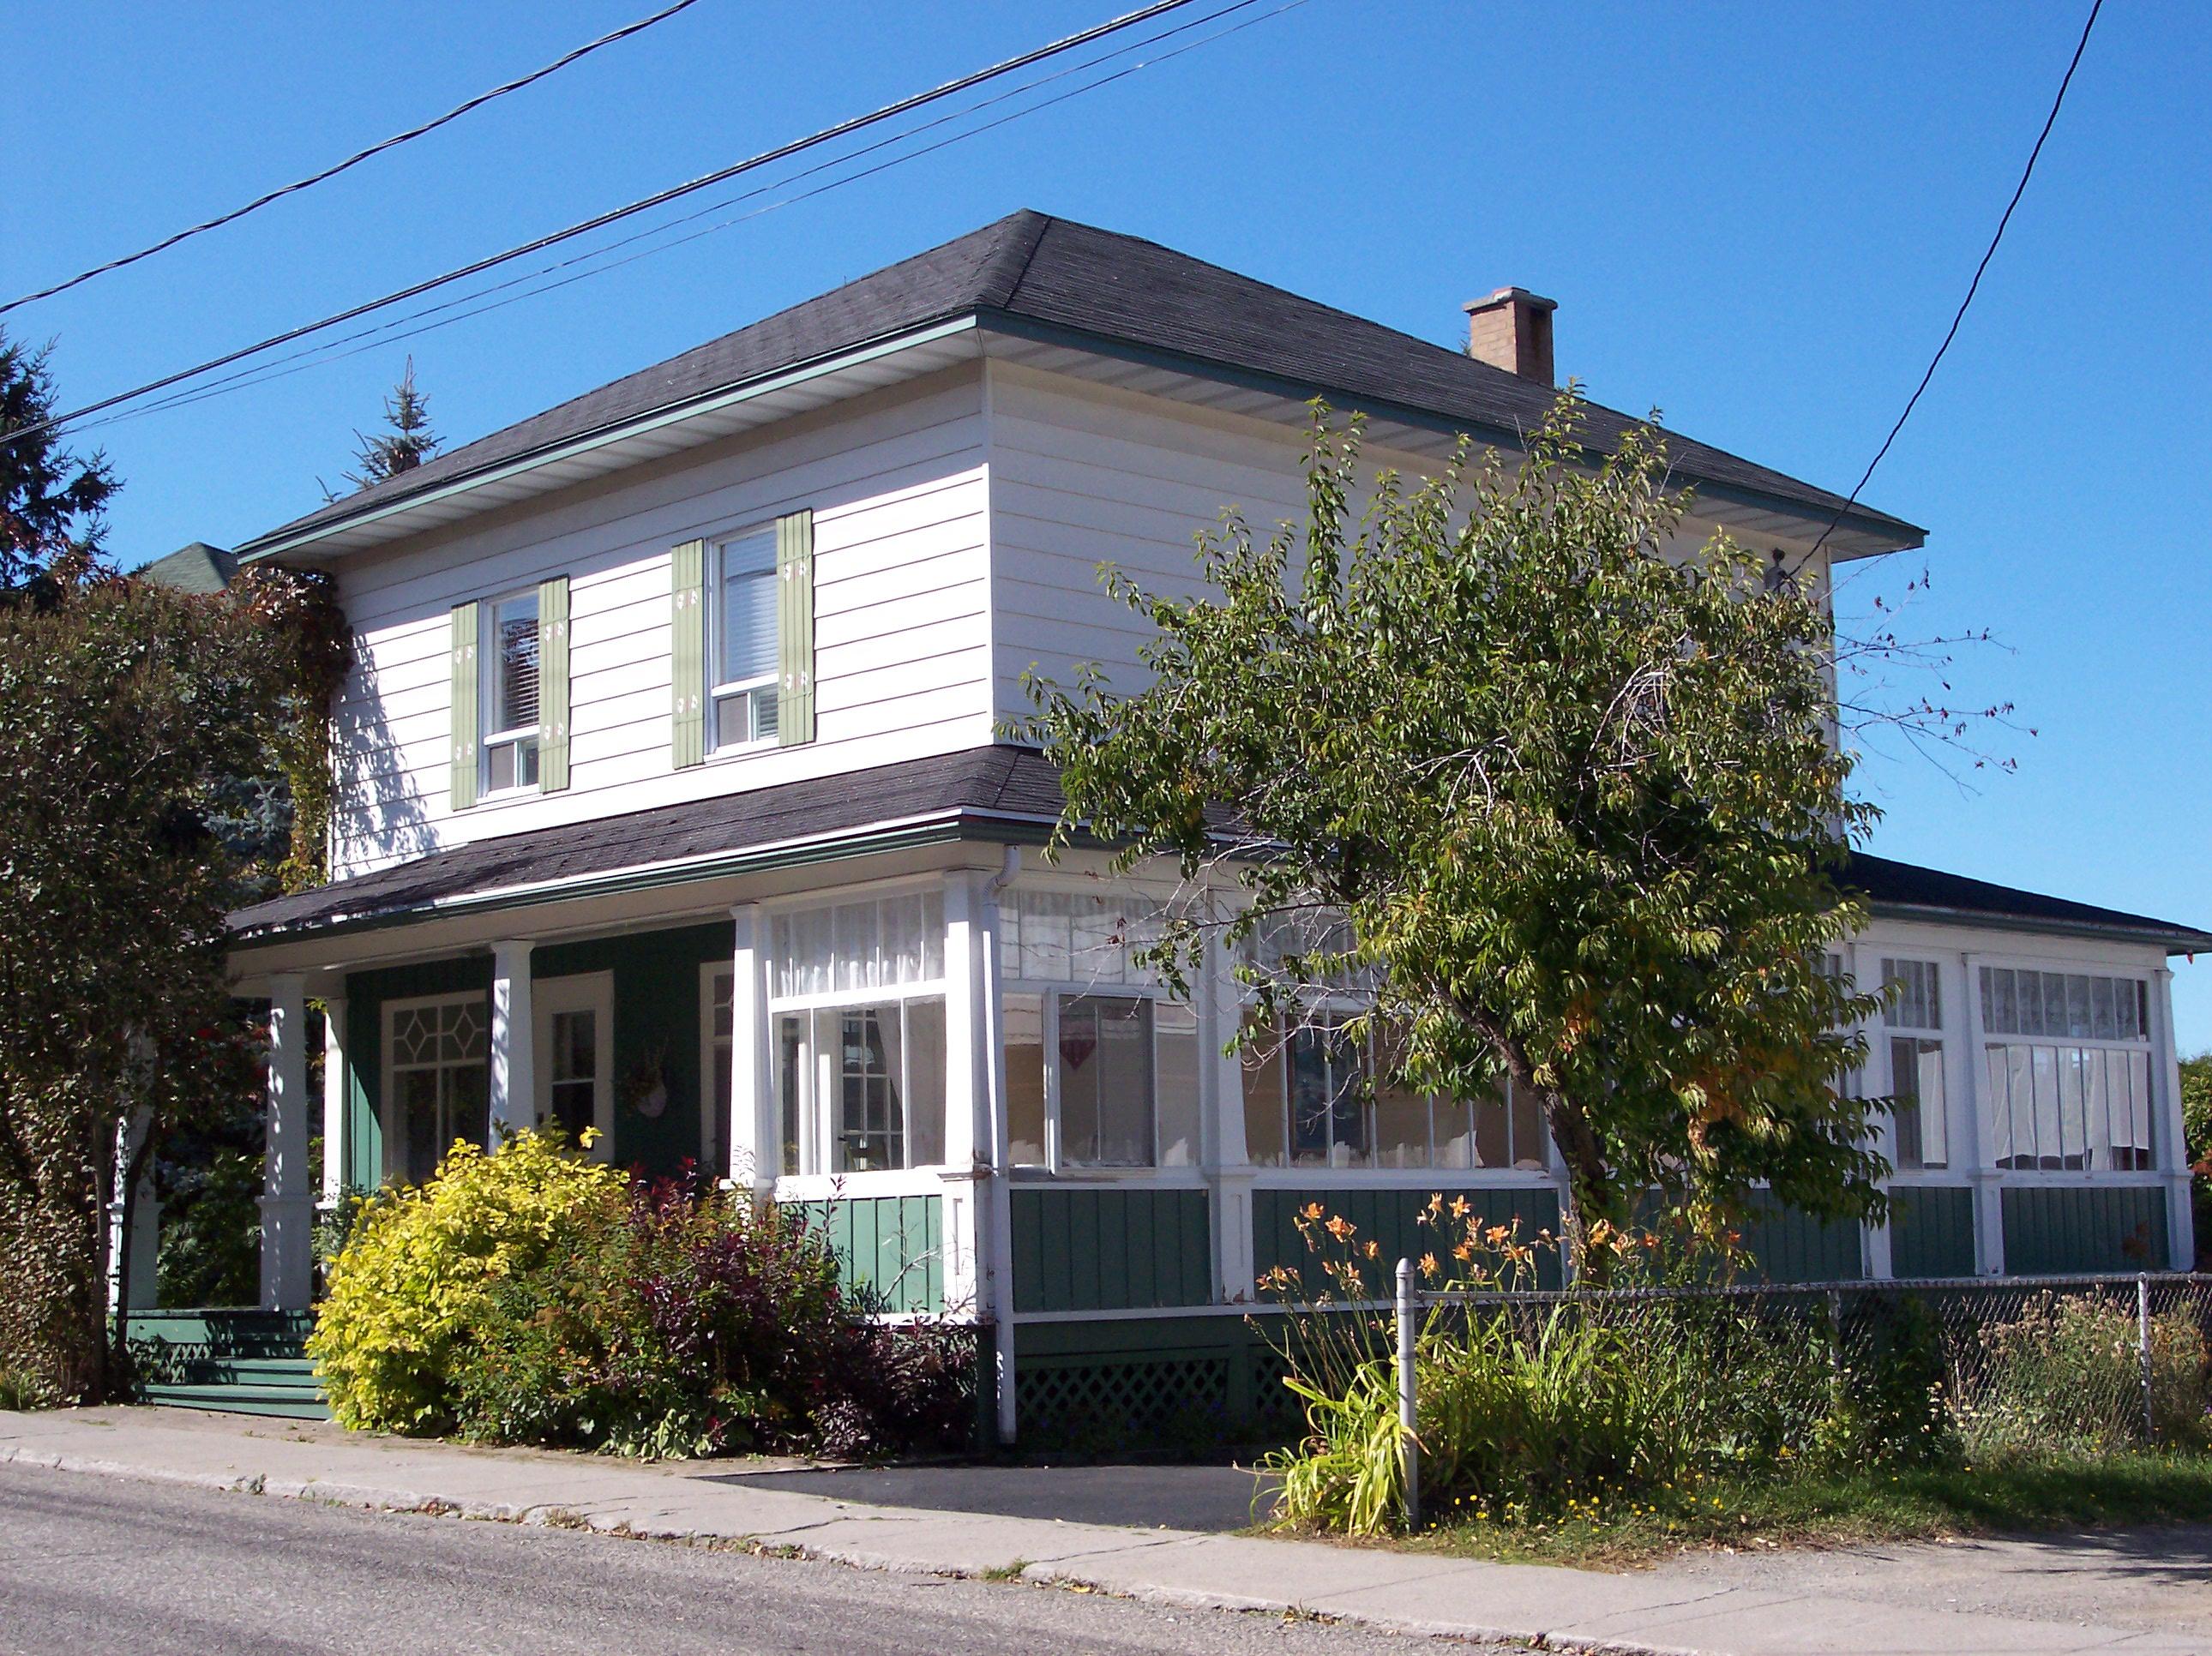 1786 - 410, rue La Salle